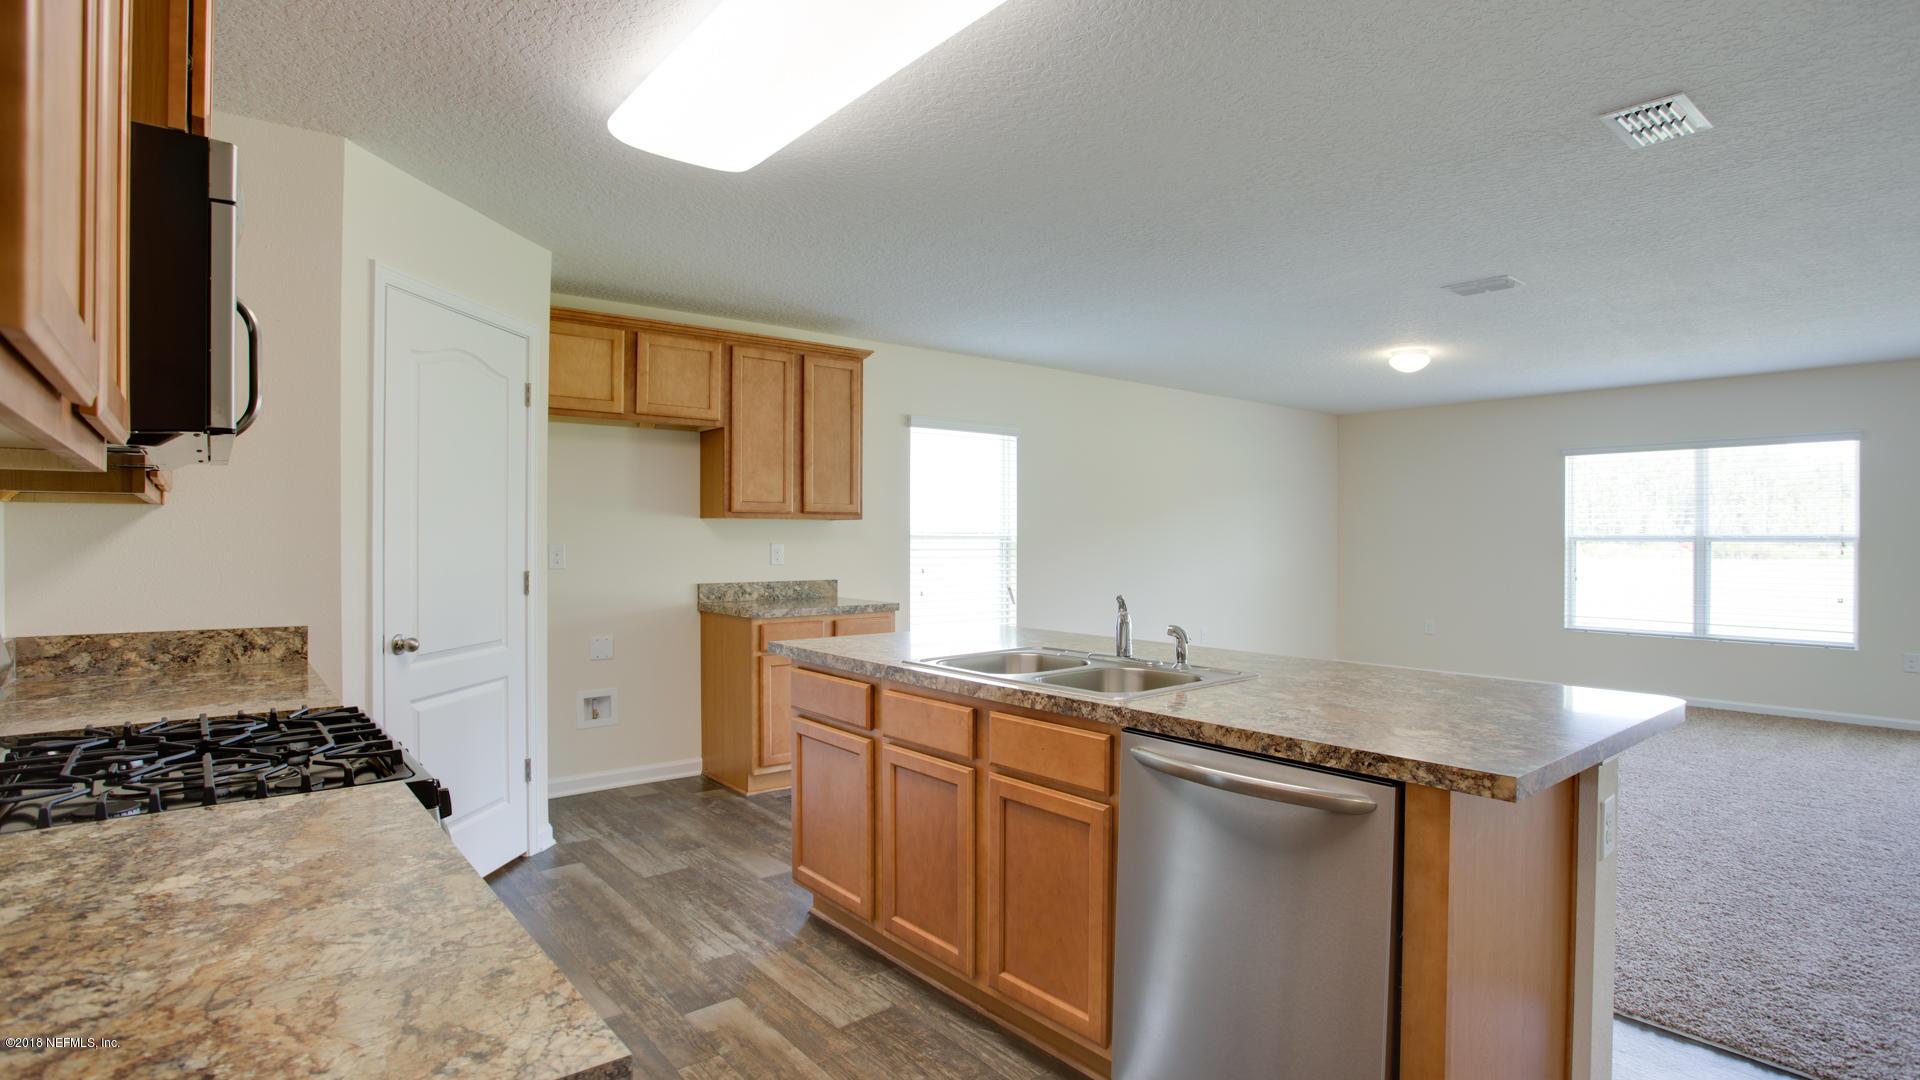 129 FAIRWAY, BUNNELL, FLORIDA 32110, 4 Bedrooms Bedrooms, ,2 BathroomsBathrooms,Residential - single family,For sale,FAIRWAY,898050